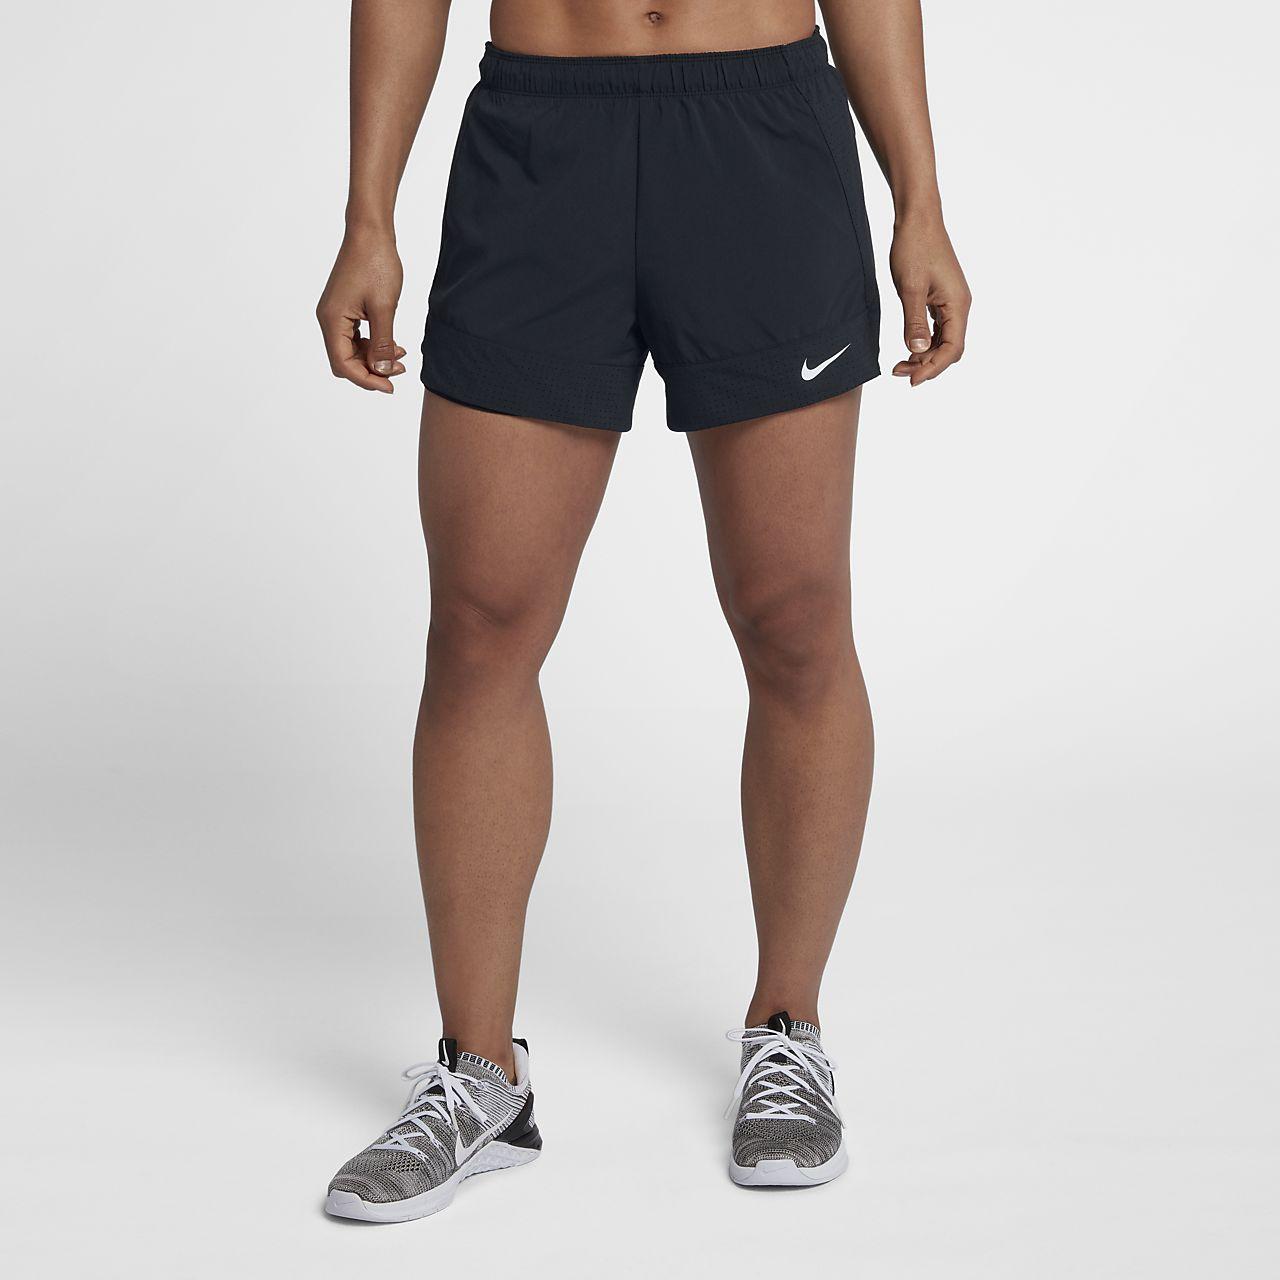 75364241328 Nike Dri-FIT Flex 2-in-1 Trainingsshorts voor dames. Nike.com NL